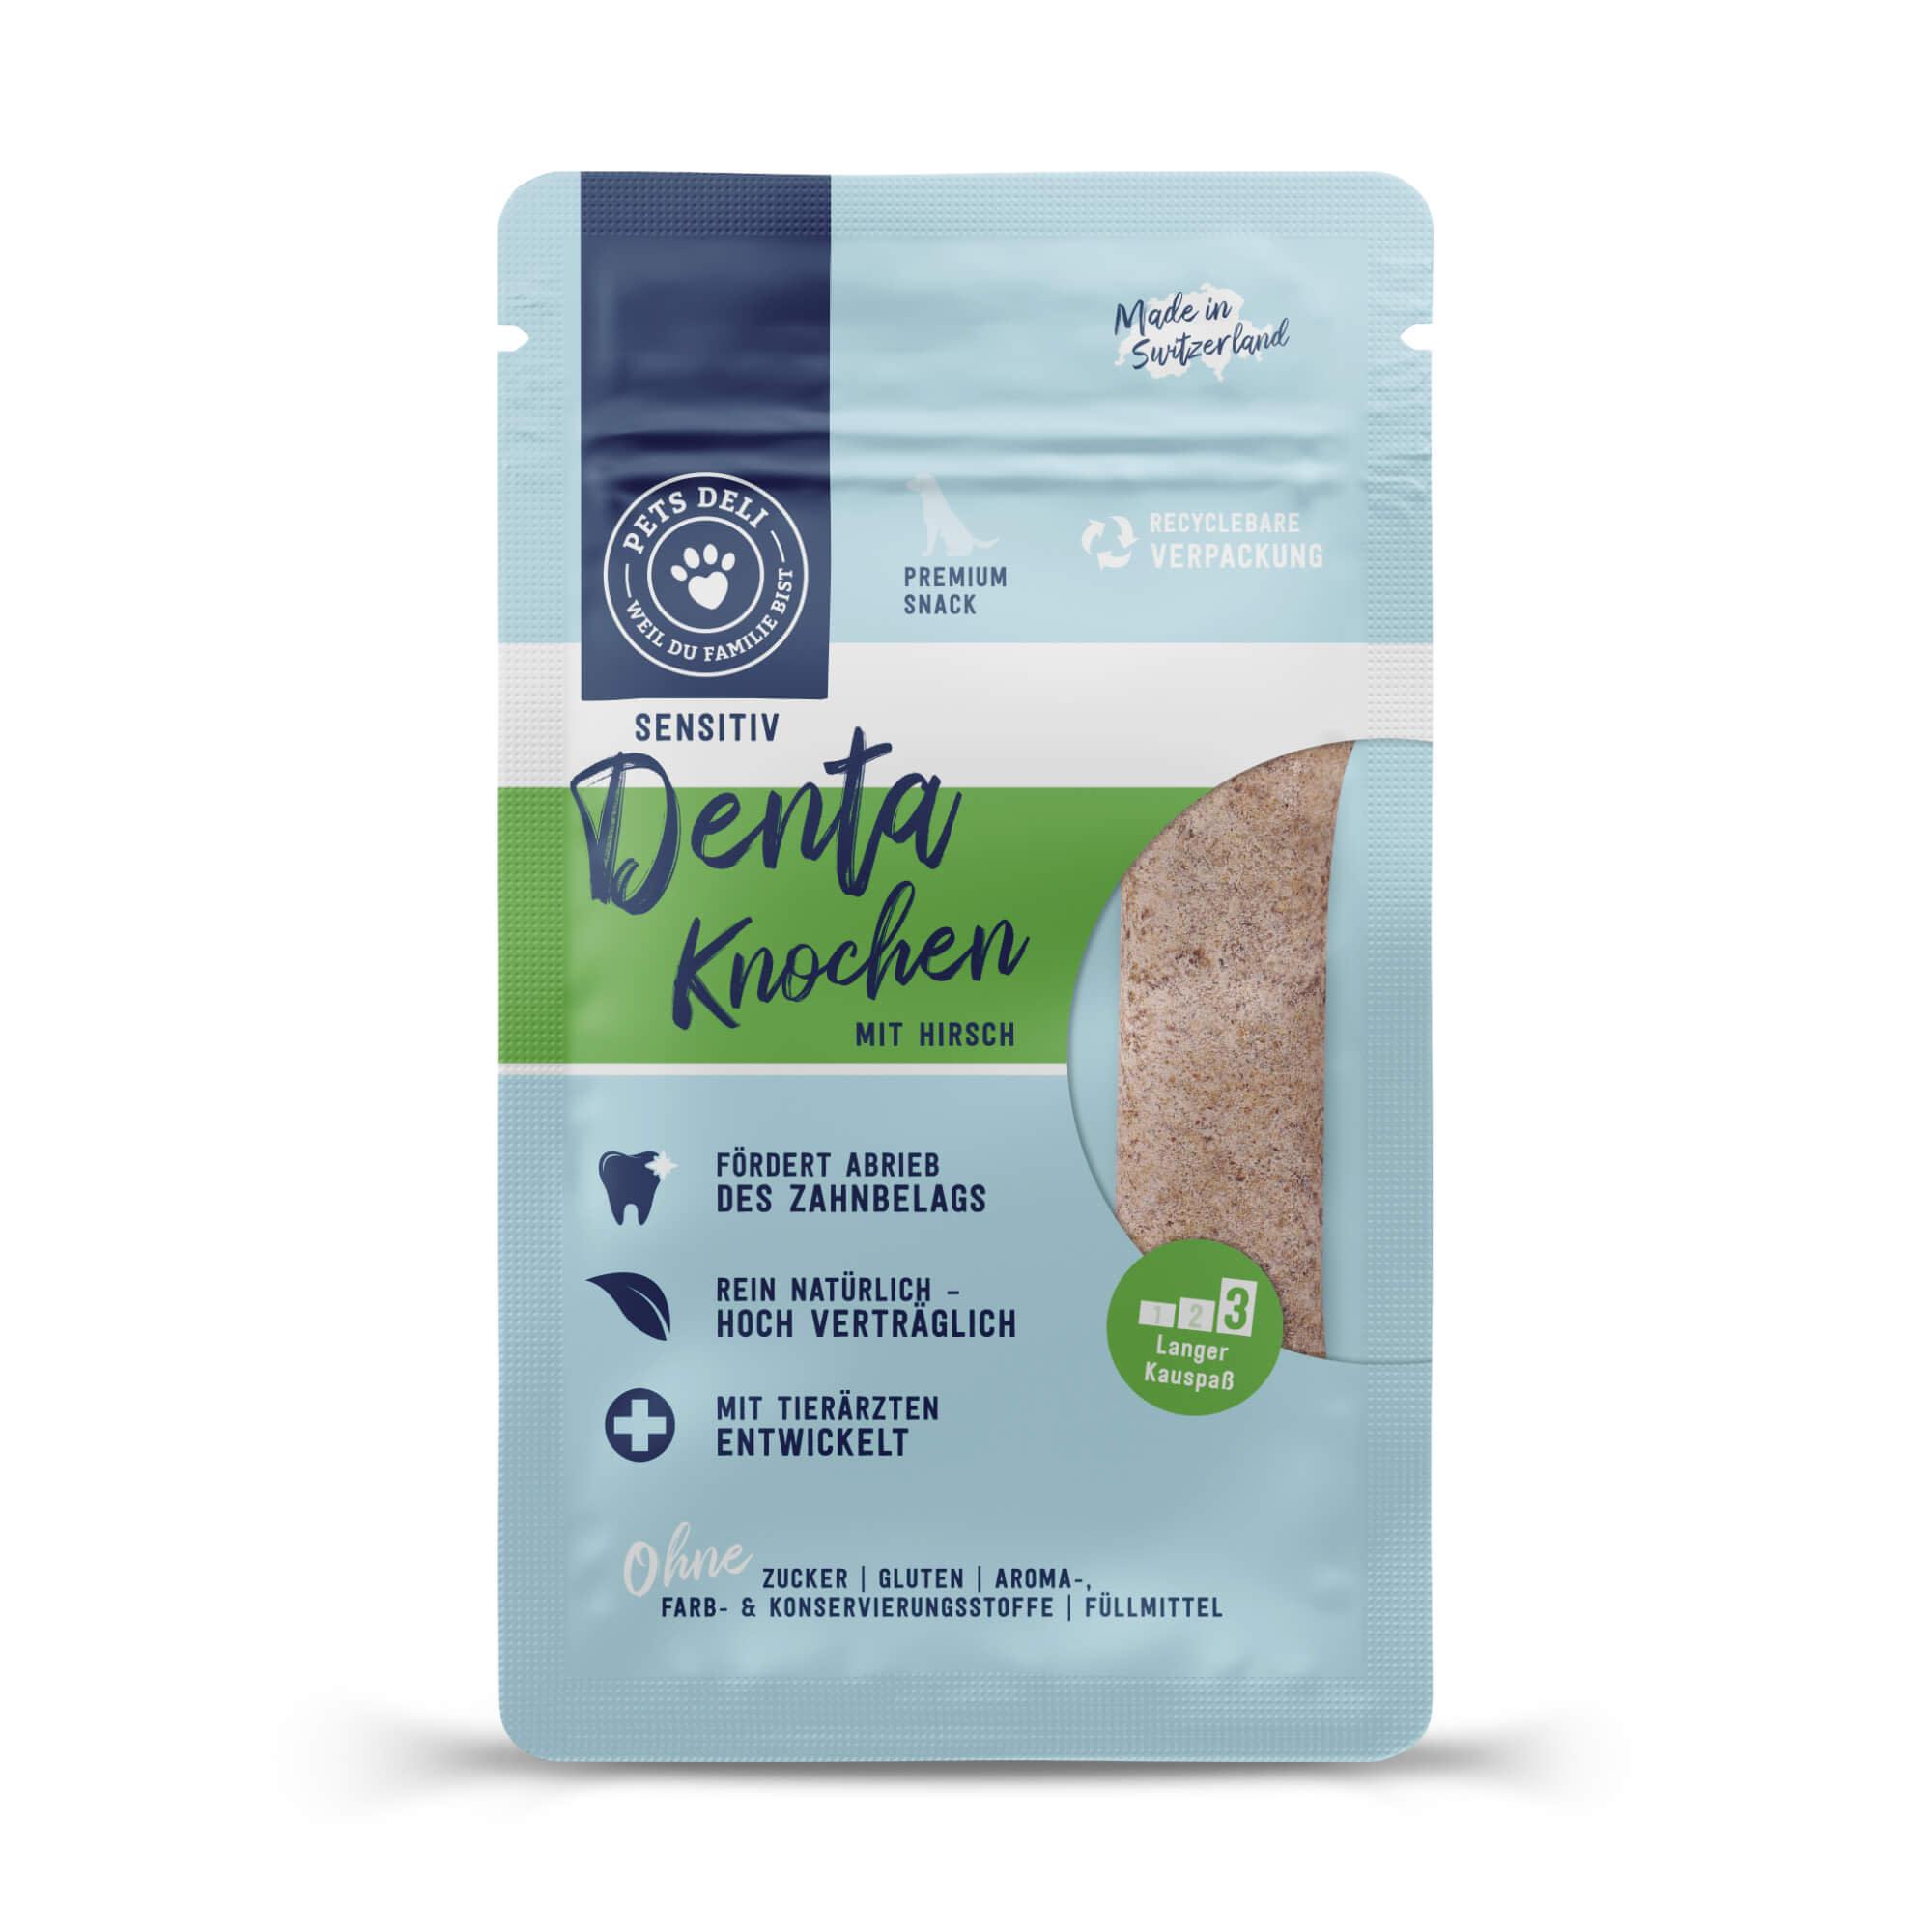 pd-hund-snacks-denta-knochen-hirsch-sensitiv-01